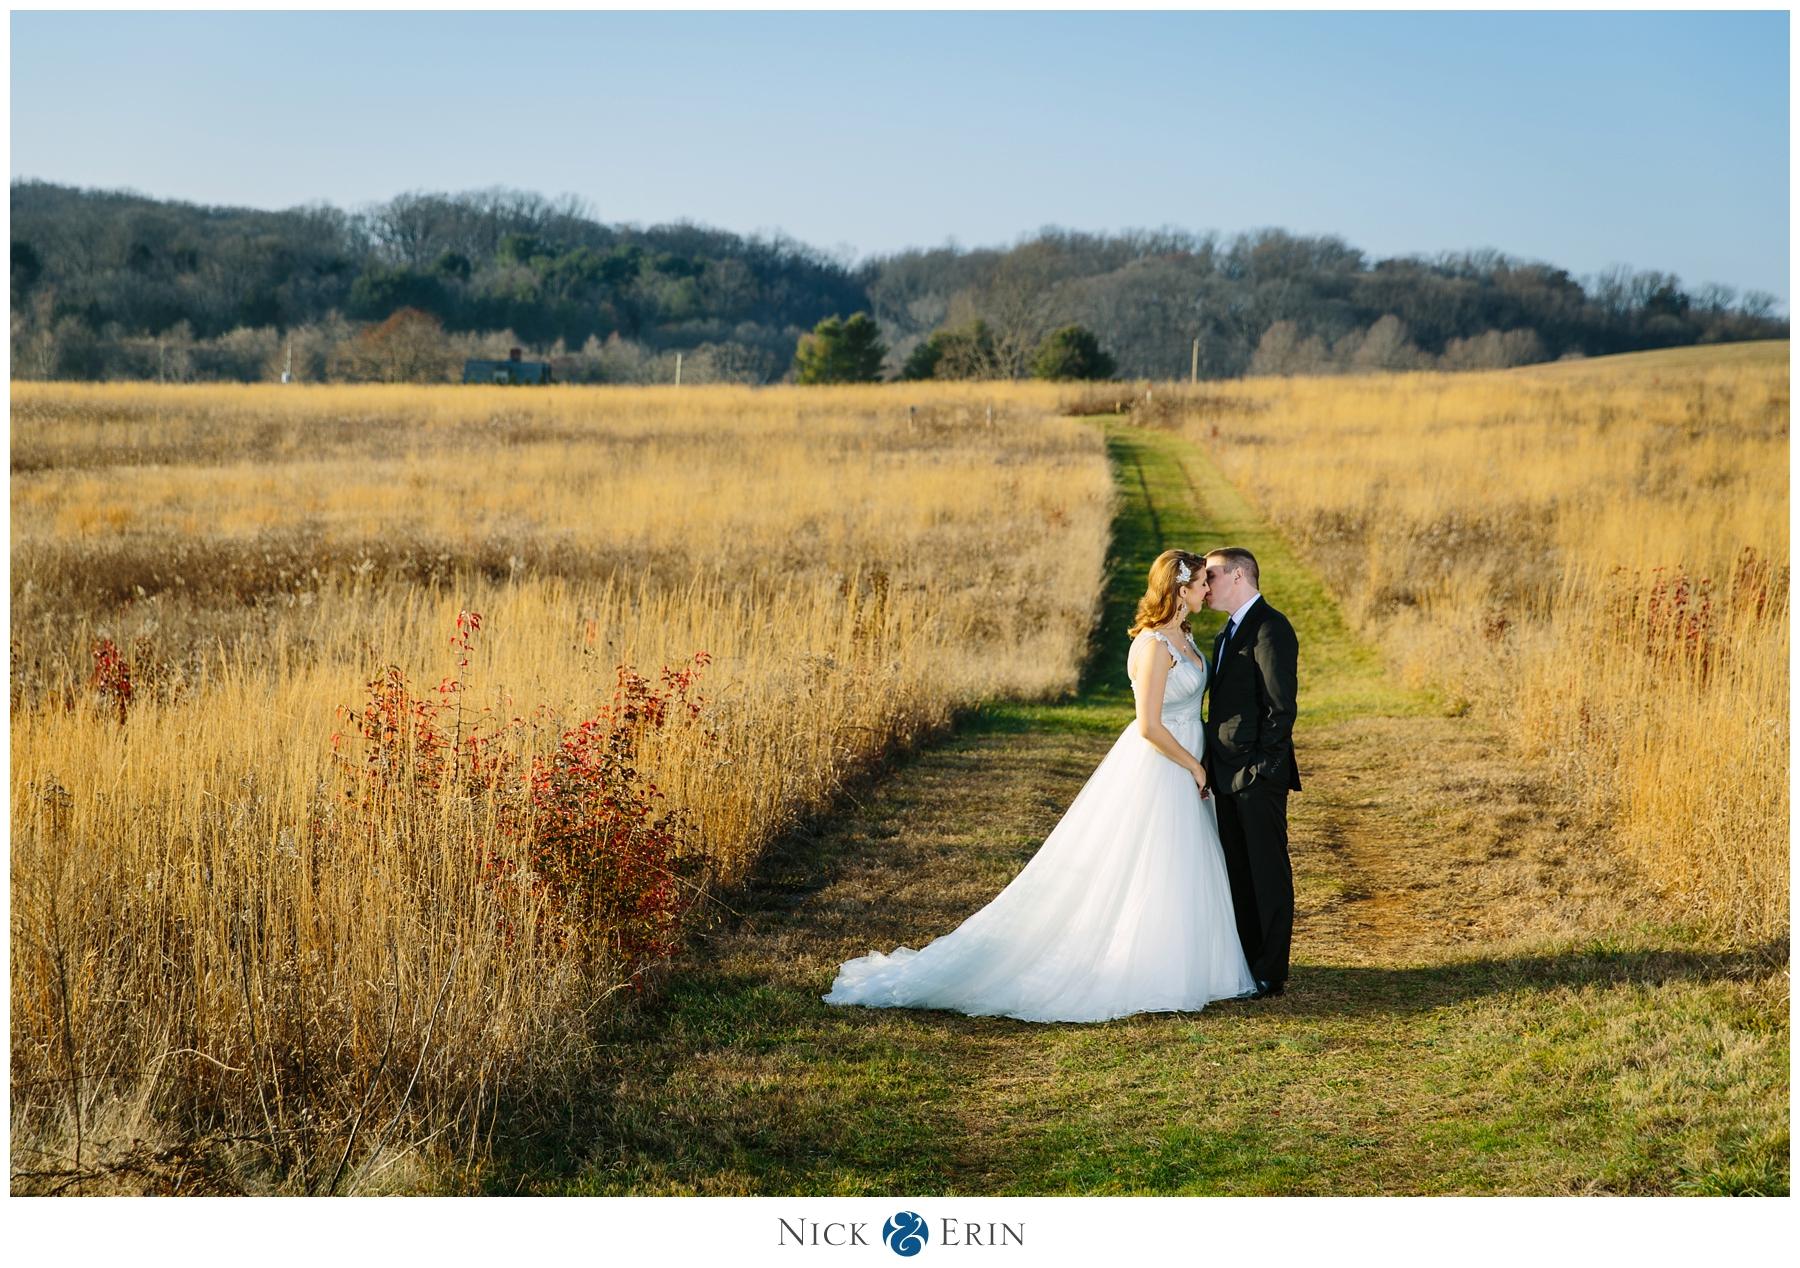 Donner_Photography_Mendenhall Inn Wedding_Blake & Kristina_0001